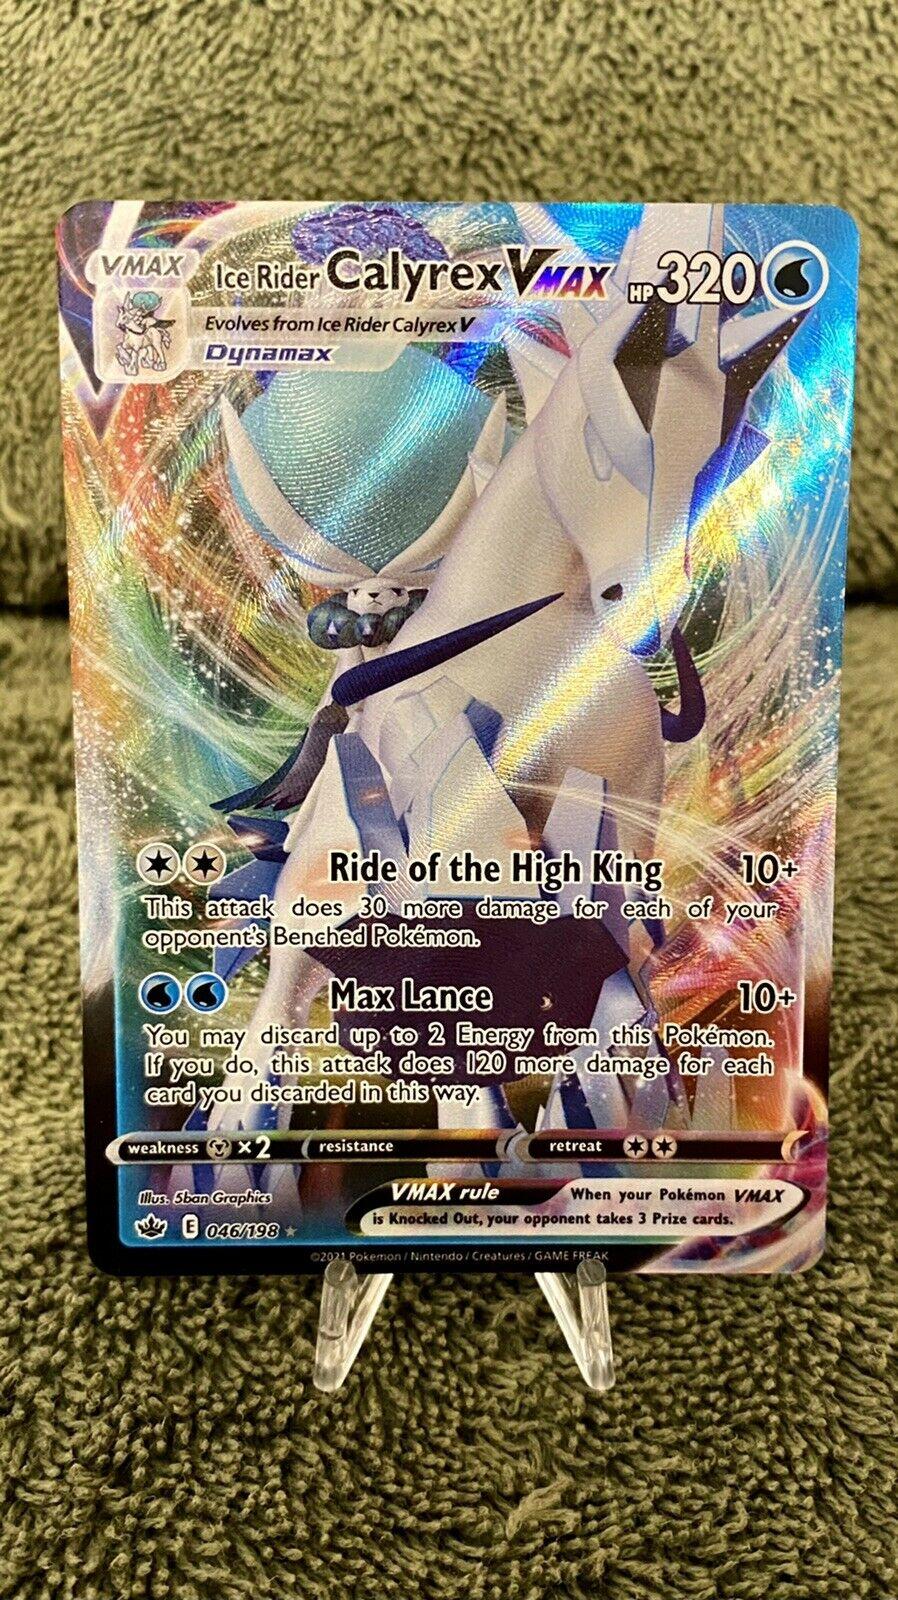 Ice Rider Calyrex VMAX 046/198 Full Art Pokémon Chilling Reign NM